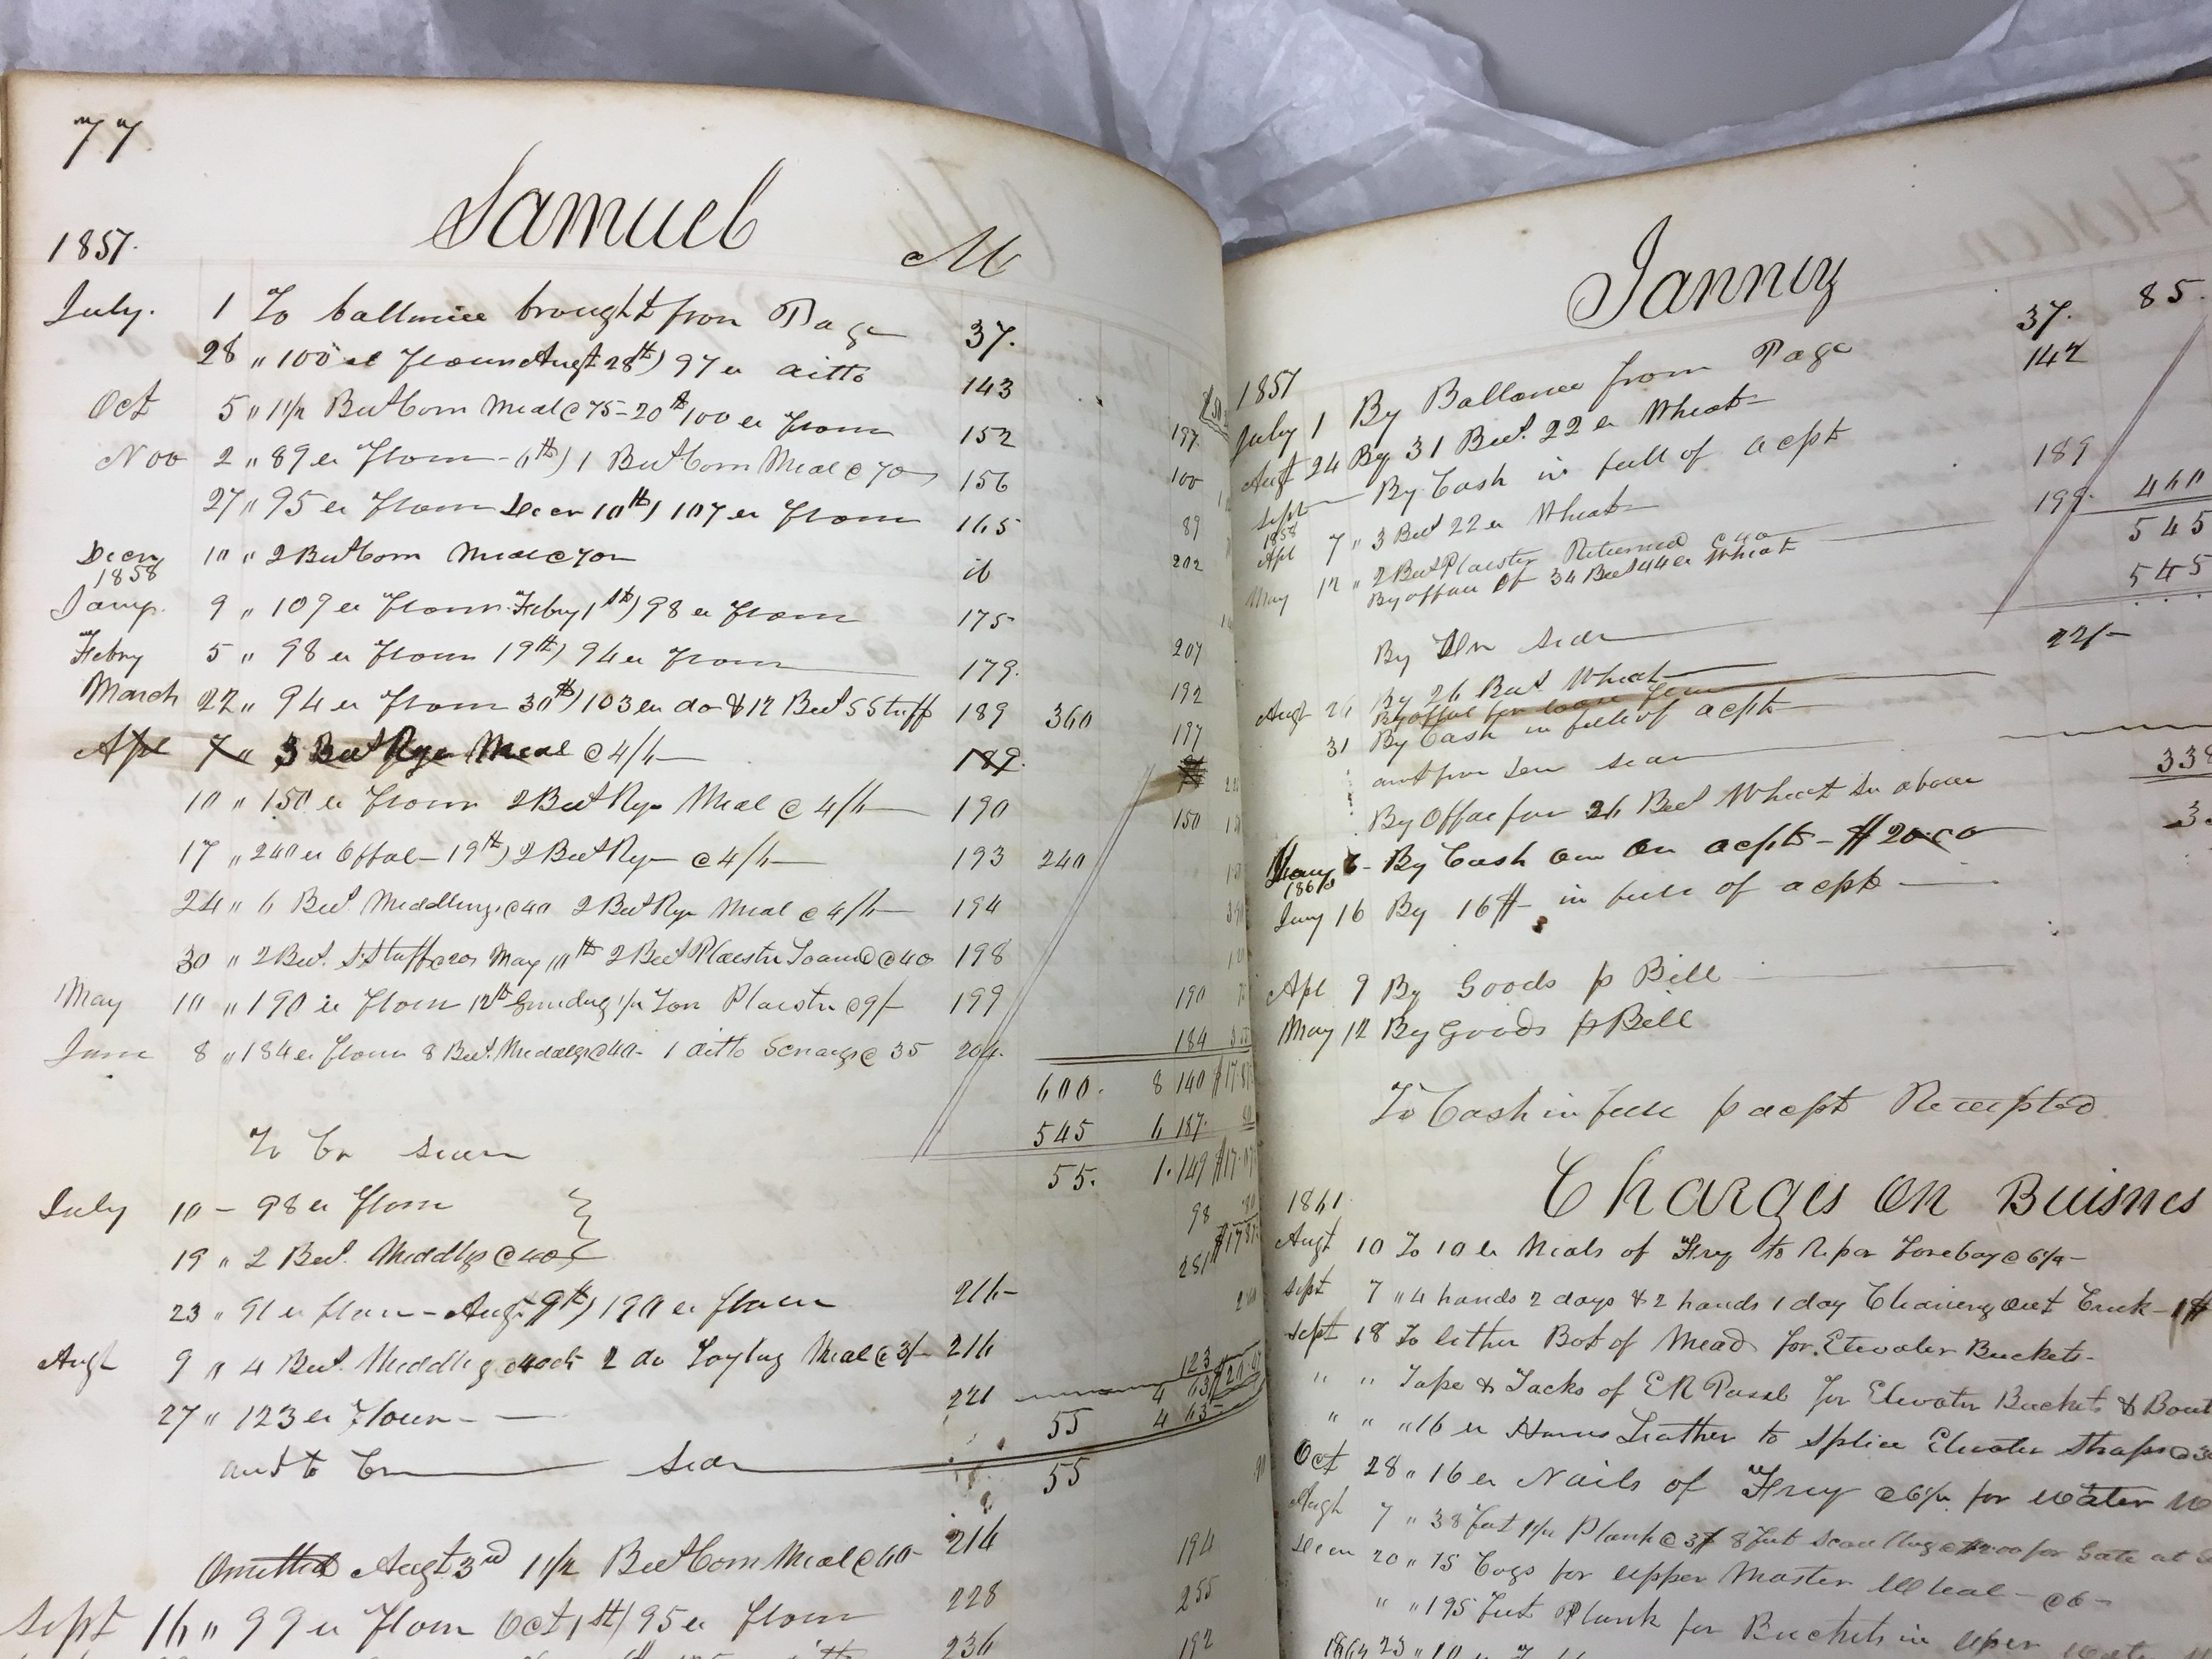 Samuel Janney 1857 mill page